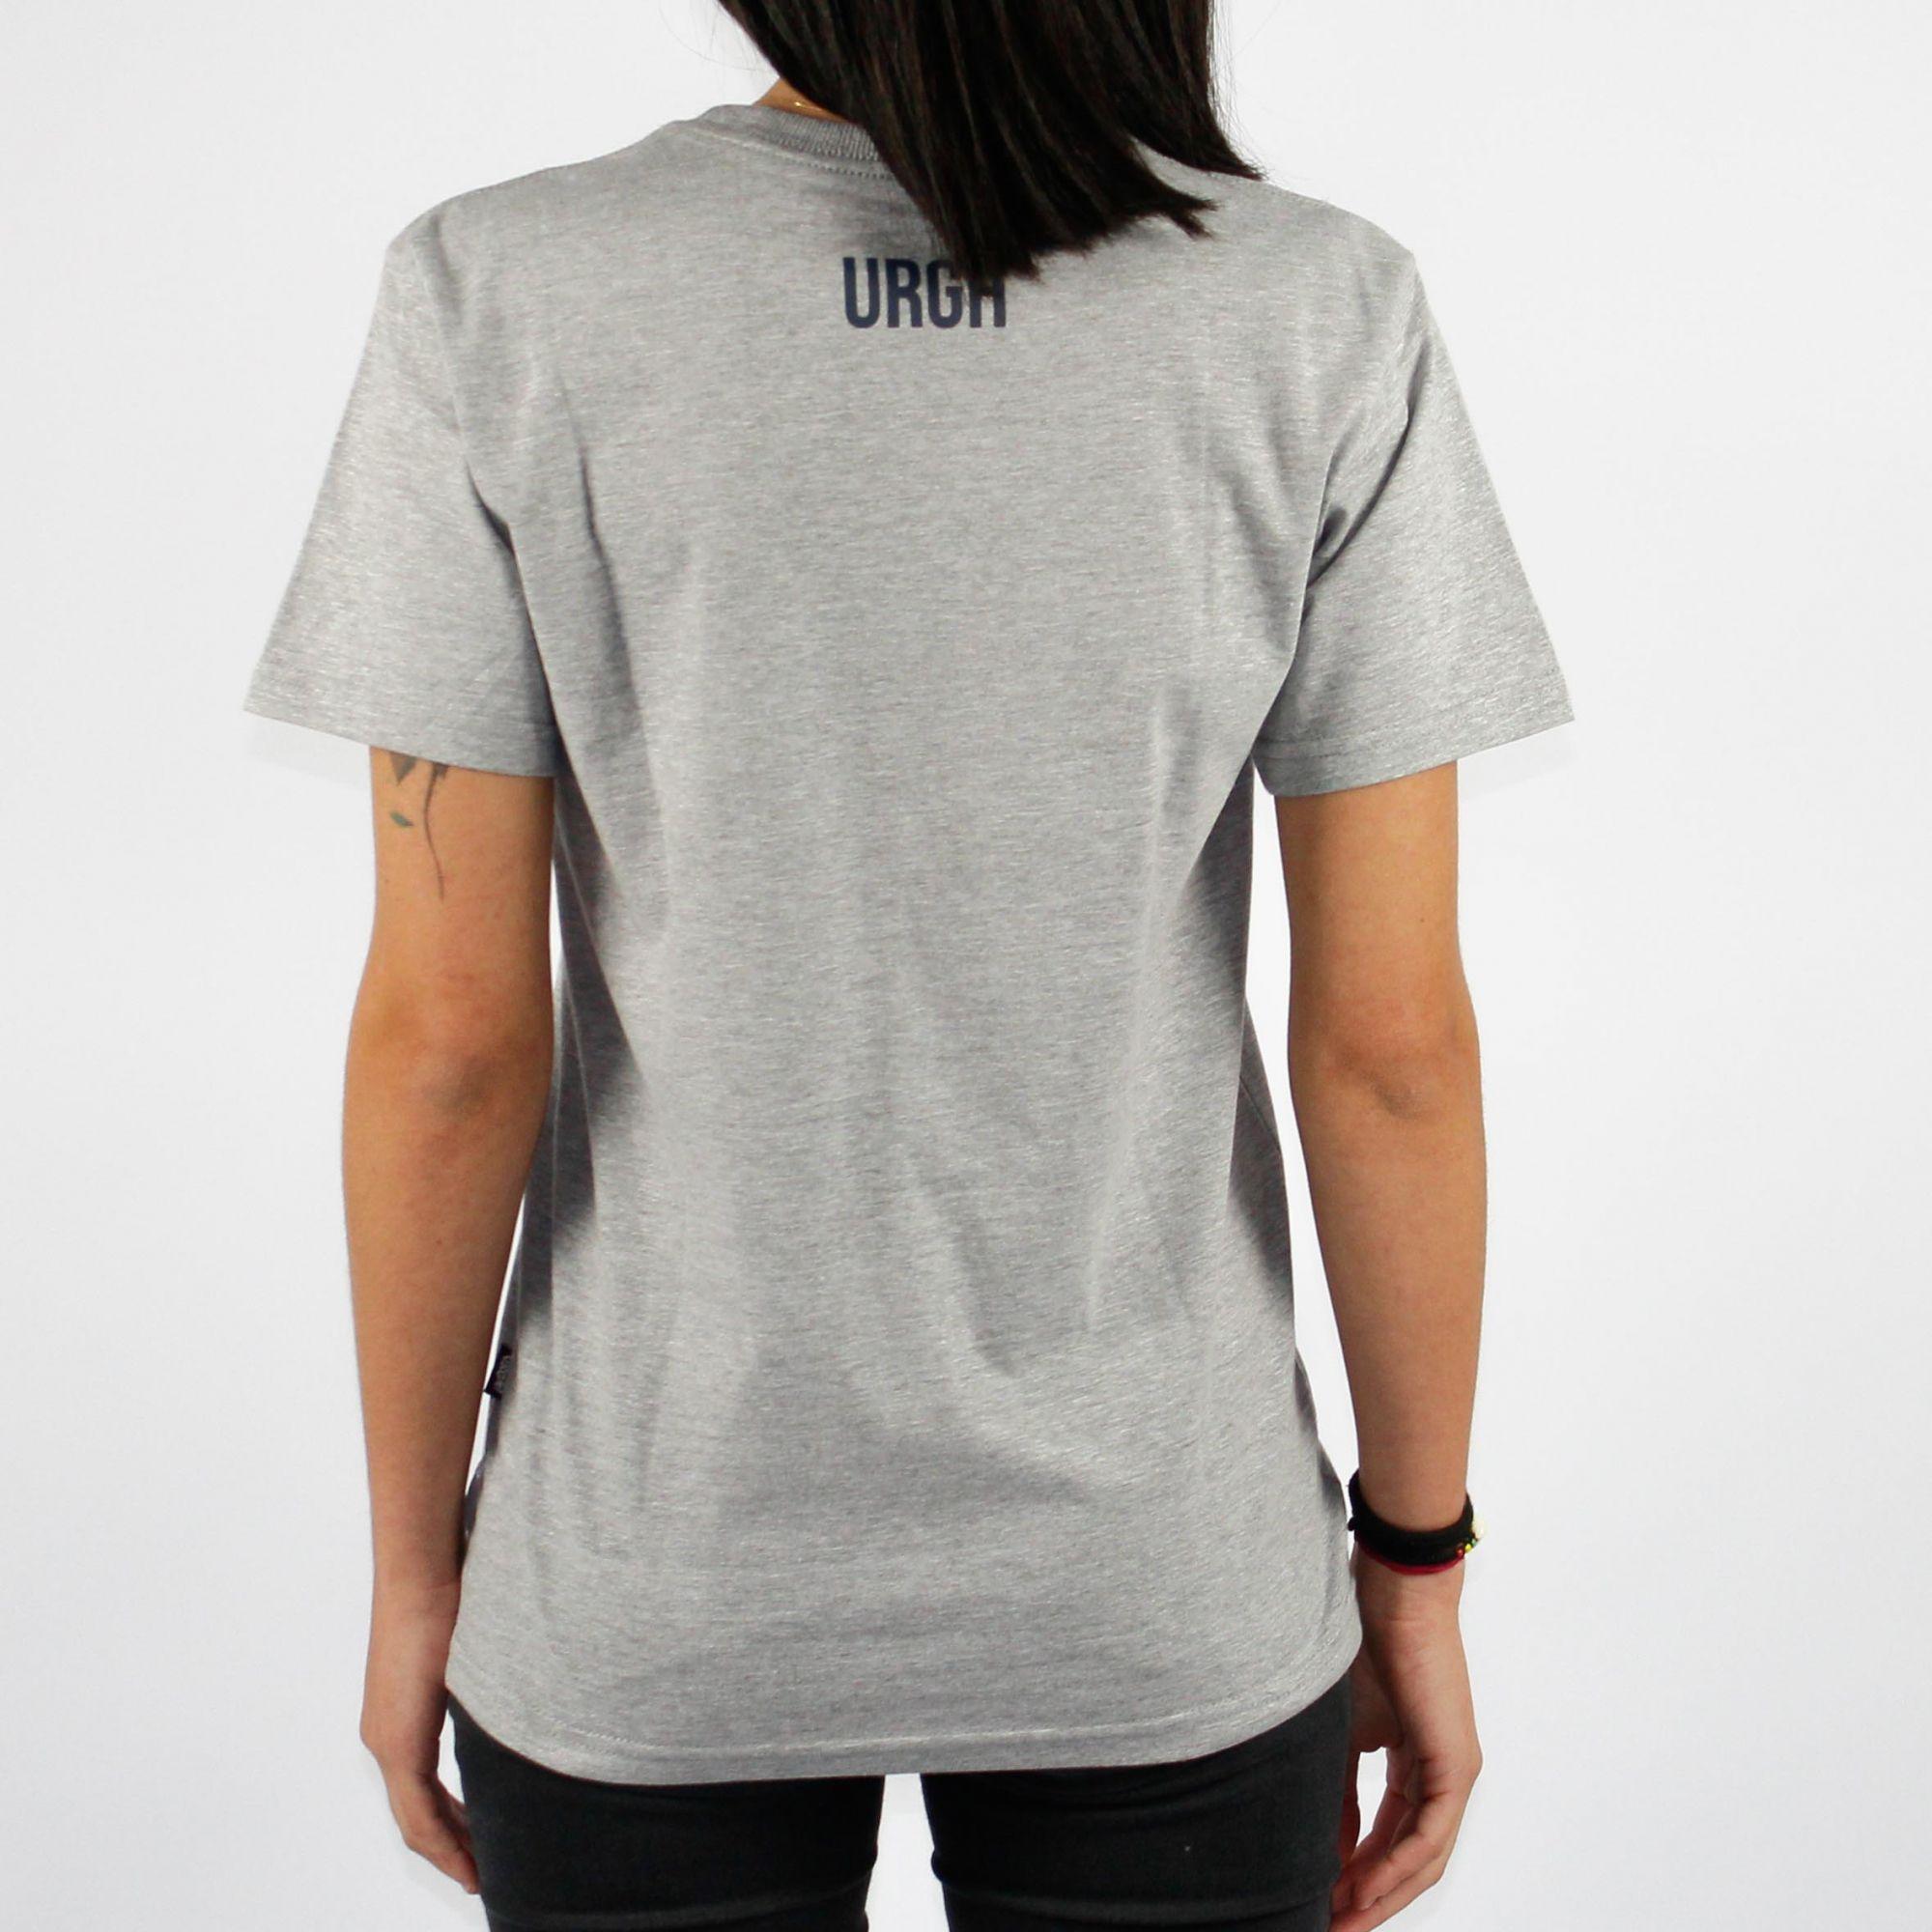 Camiseta Feminina Urgh Balão - Cinza Mescla